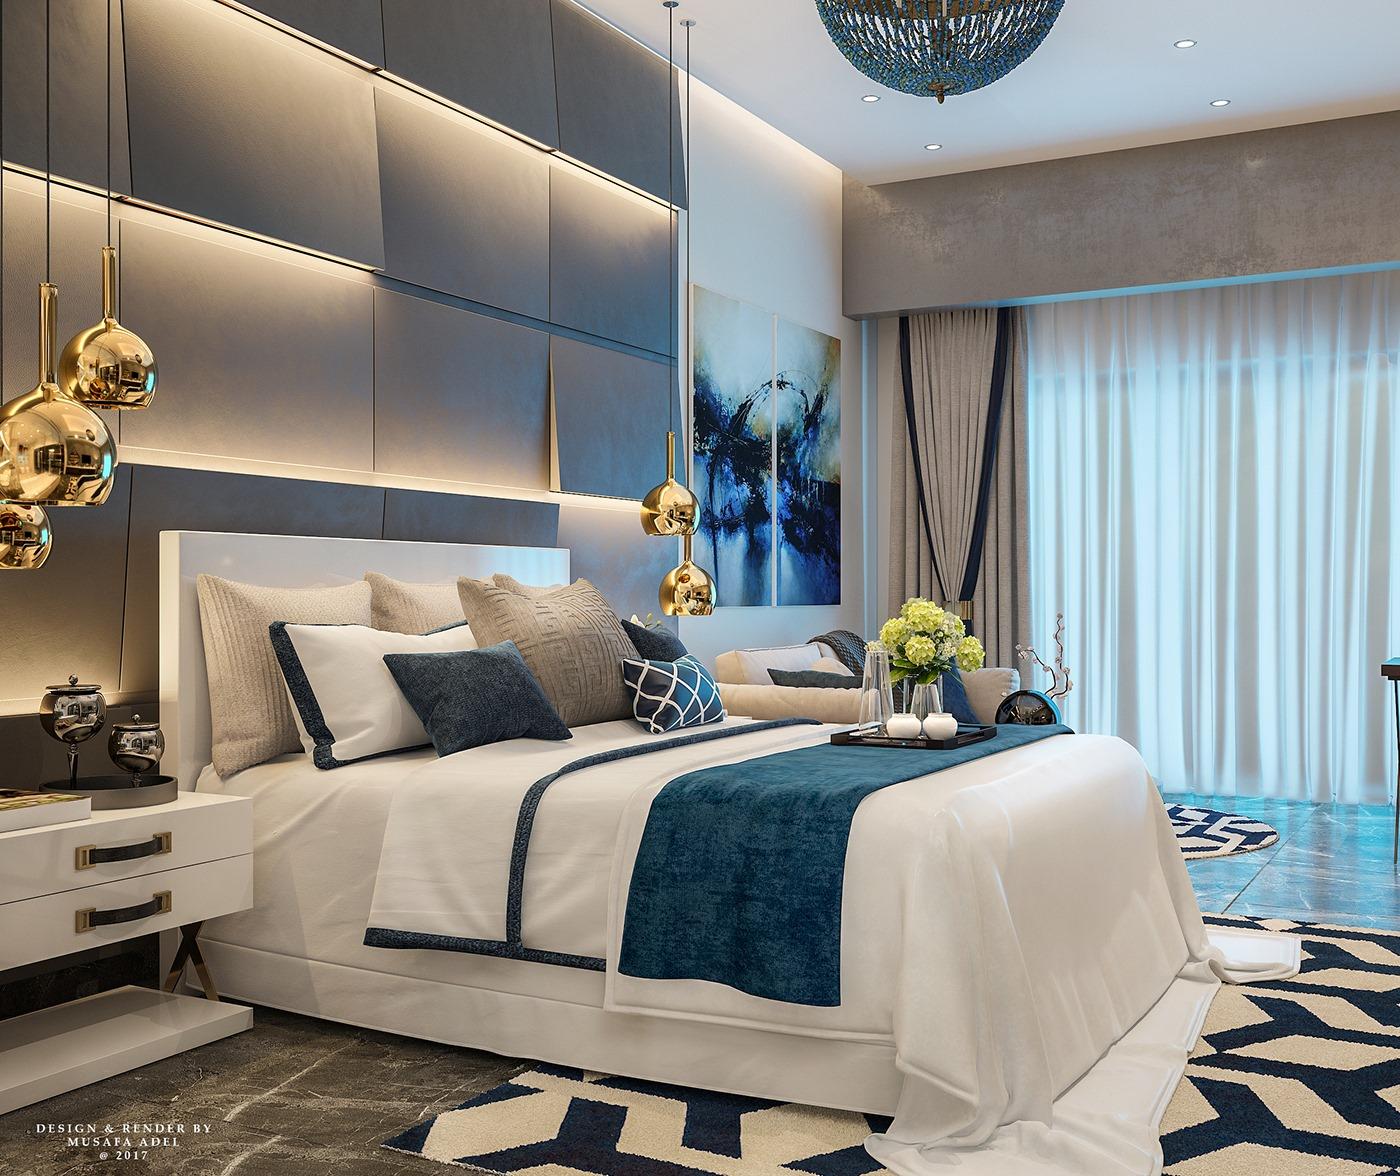 VWArtclub - Modern Hotel Room